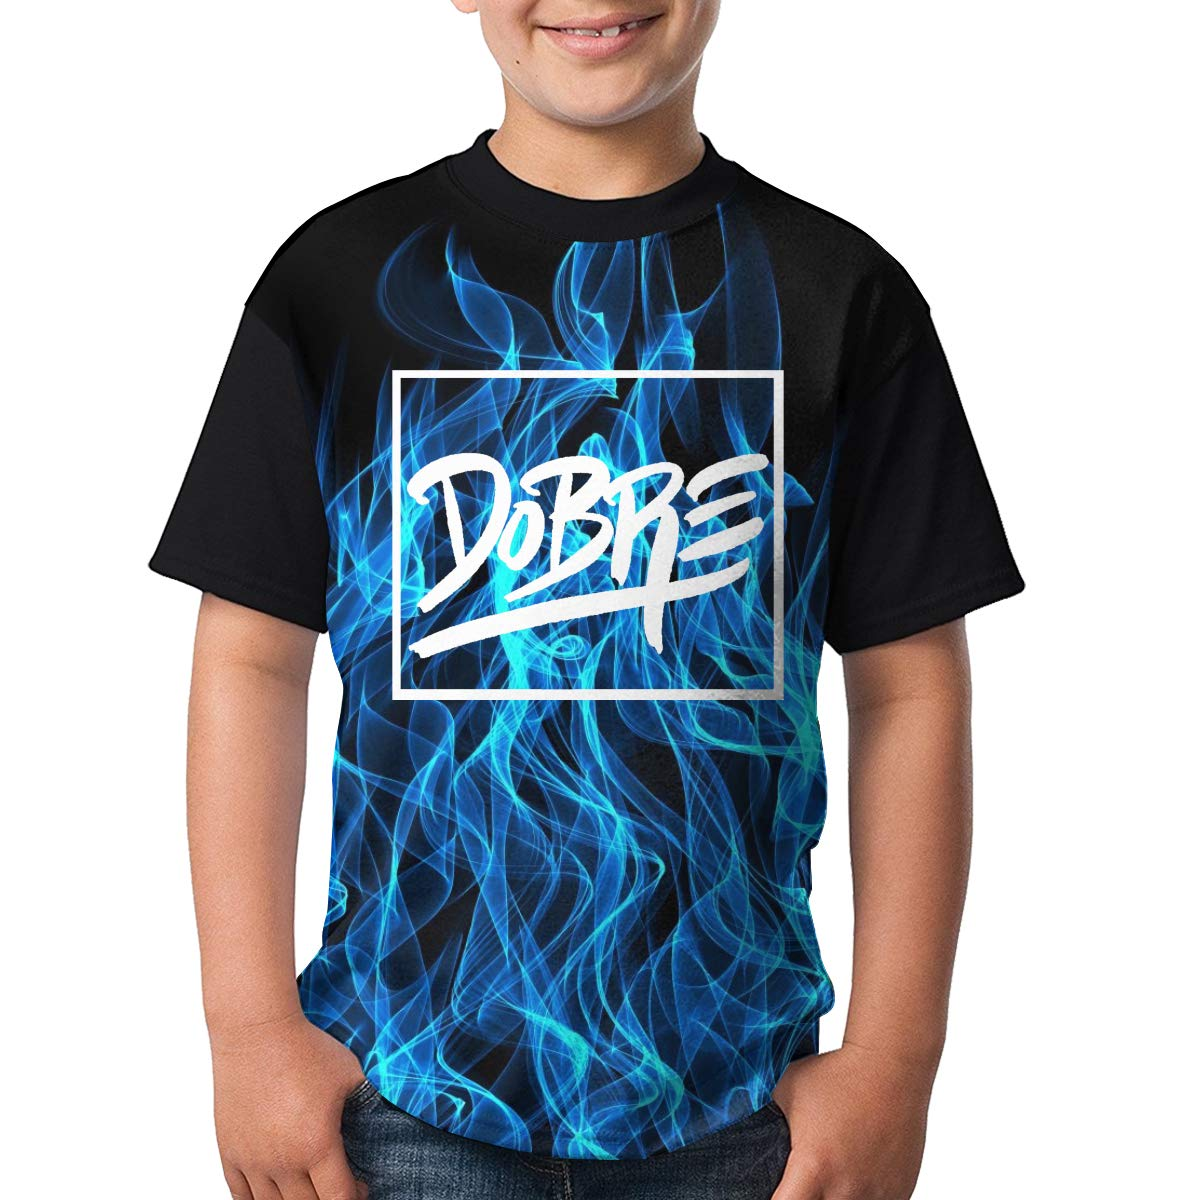 Fashion Youth Shirt Ming Group Lucas Dobre,Marcus Dobre Teenager Boys Teens Custom T-Shirt